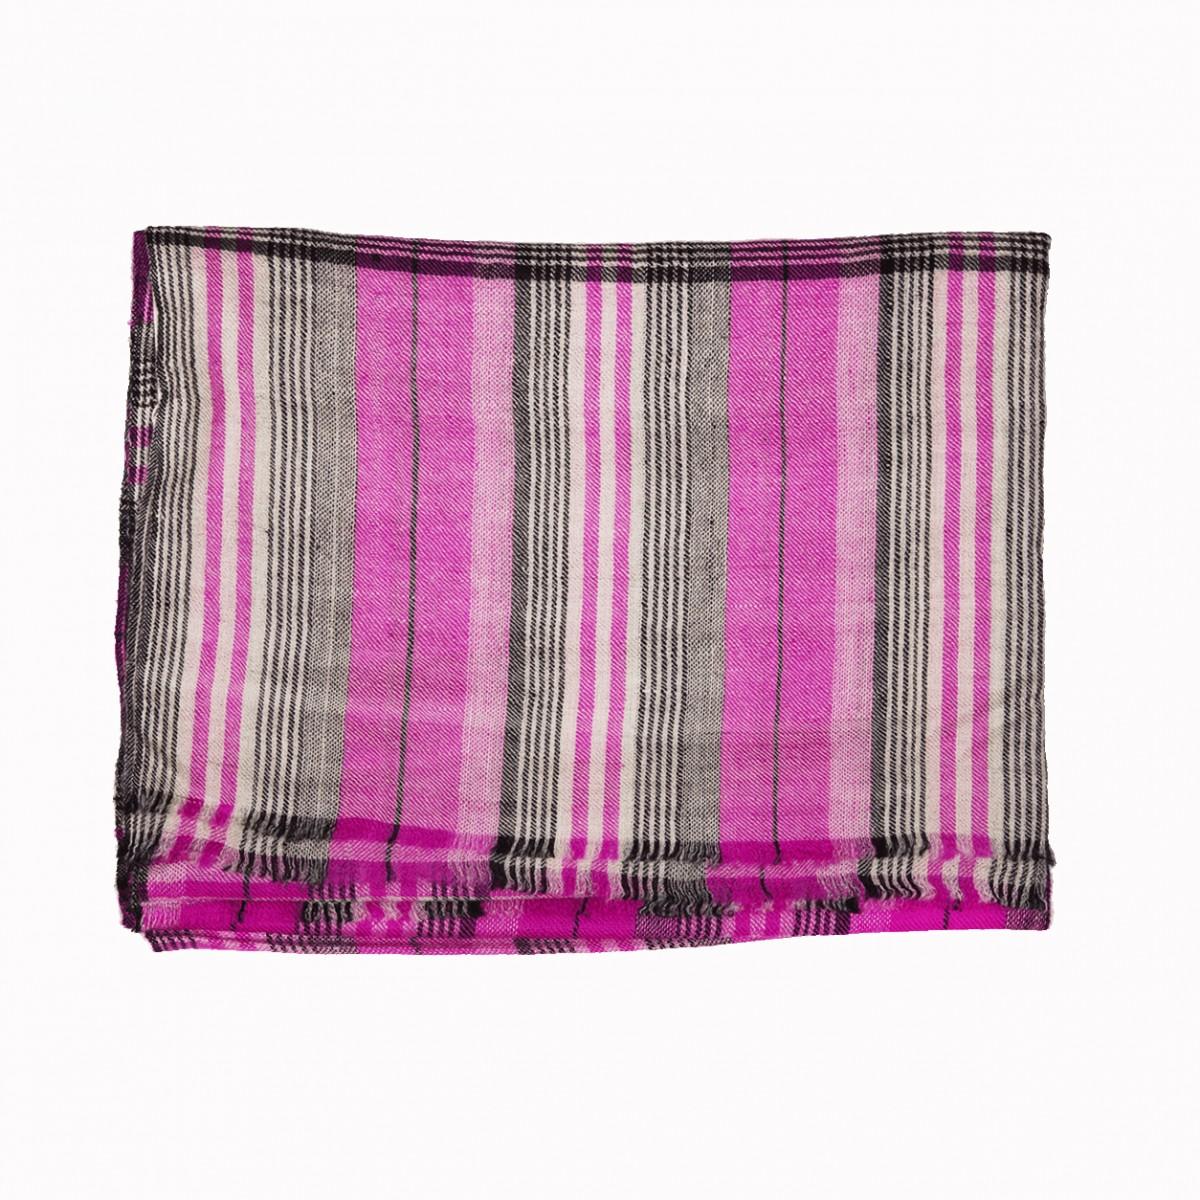 Pattern Zahid Check Pashmina Stole - Magenta Ivory Black